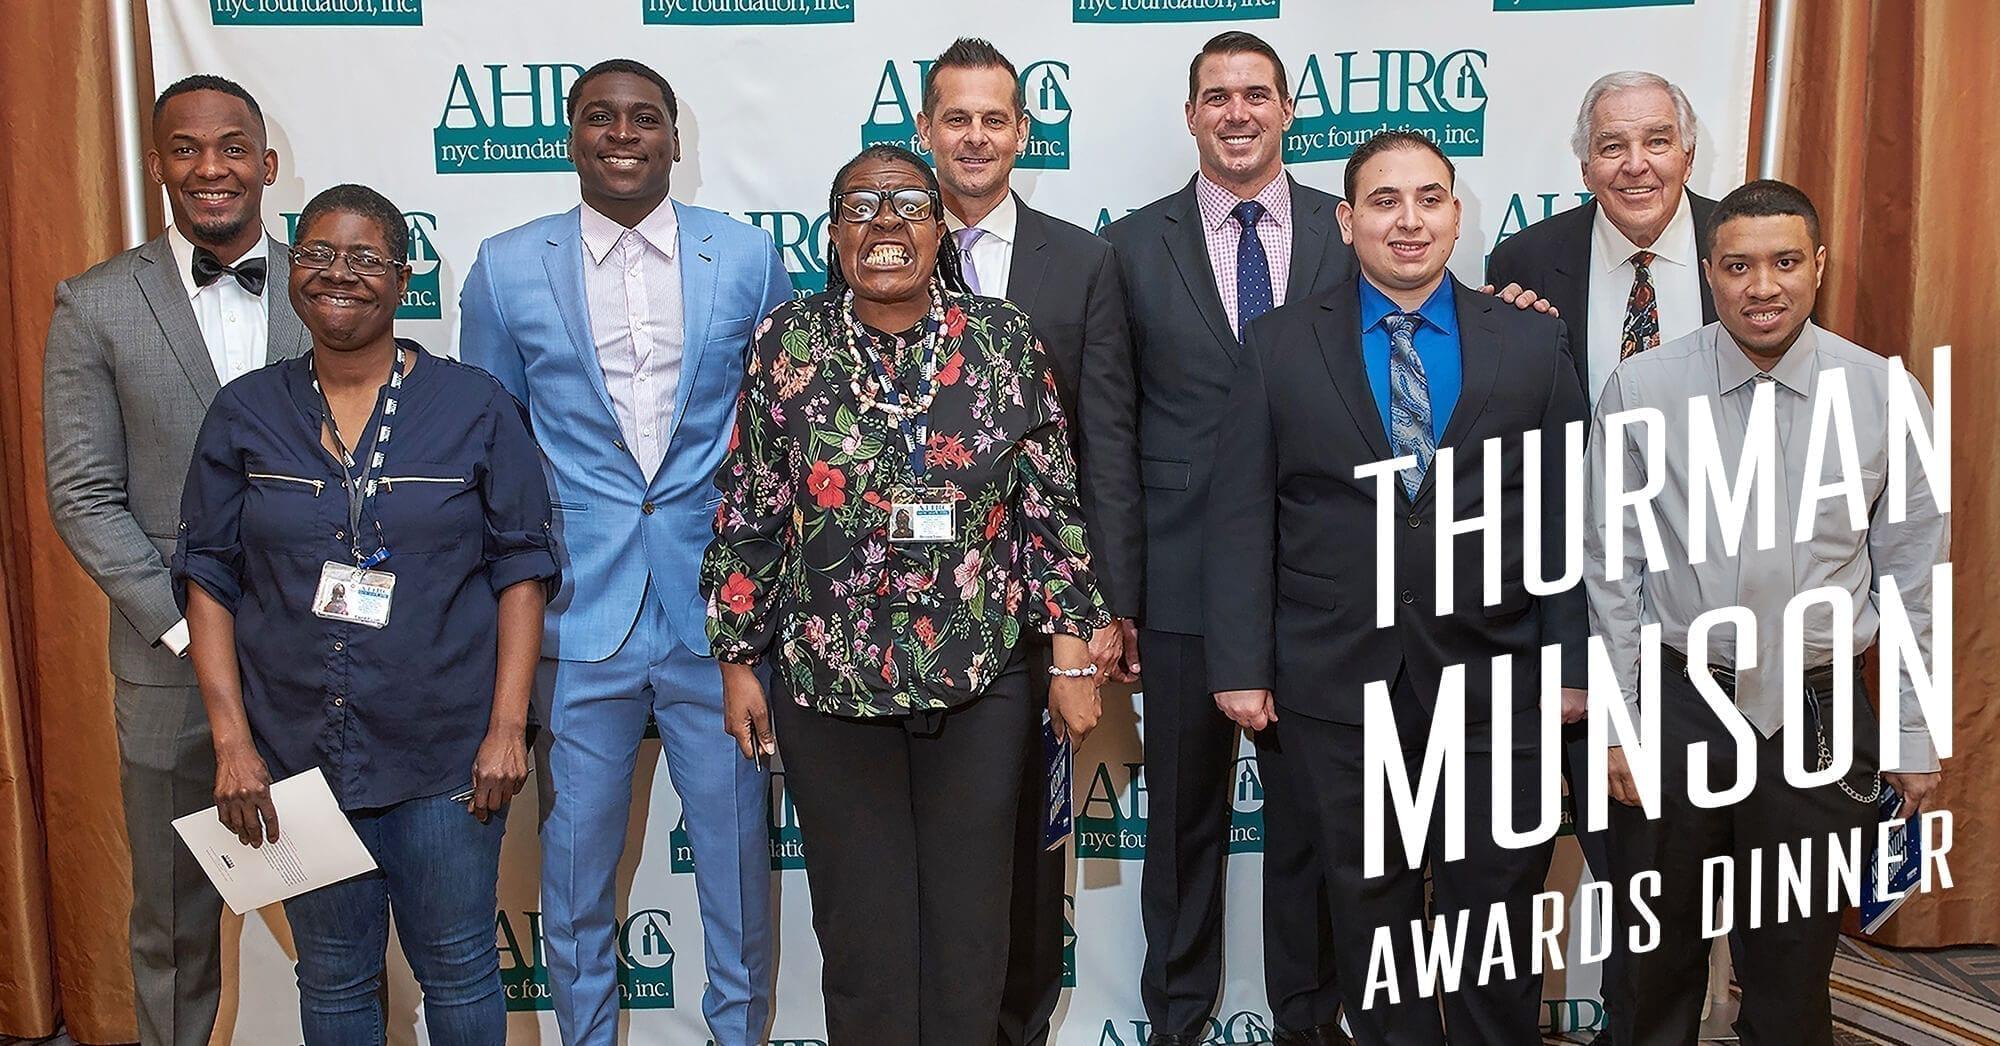 The 39th Annual Thurman Munson Awards Dinner